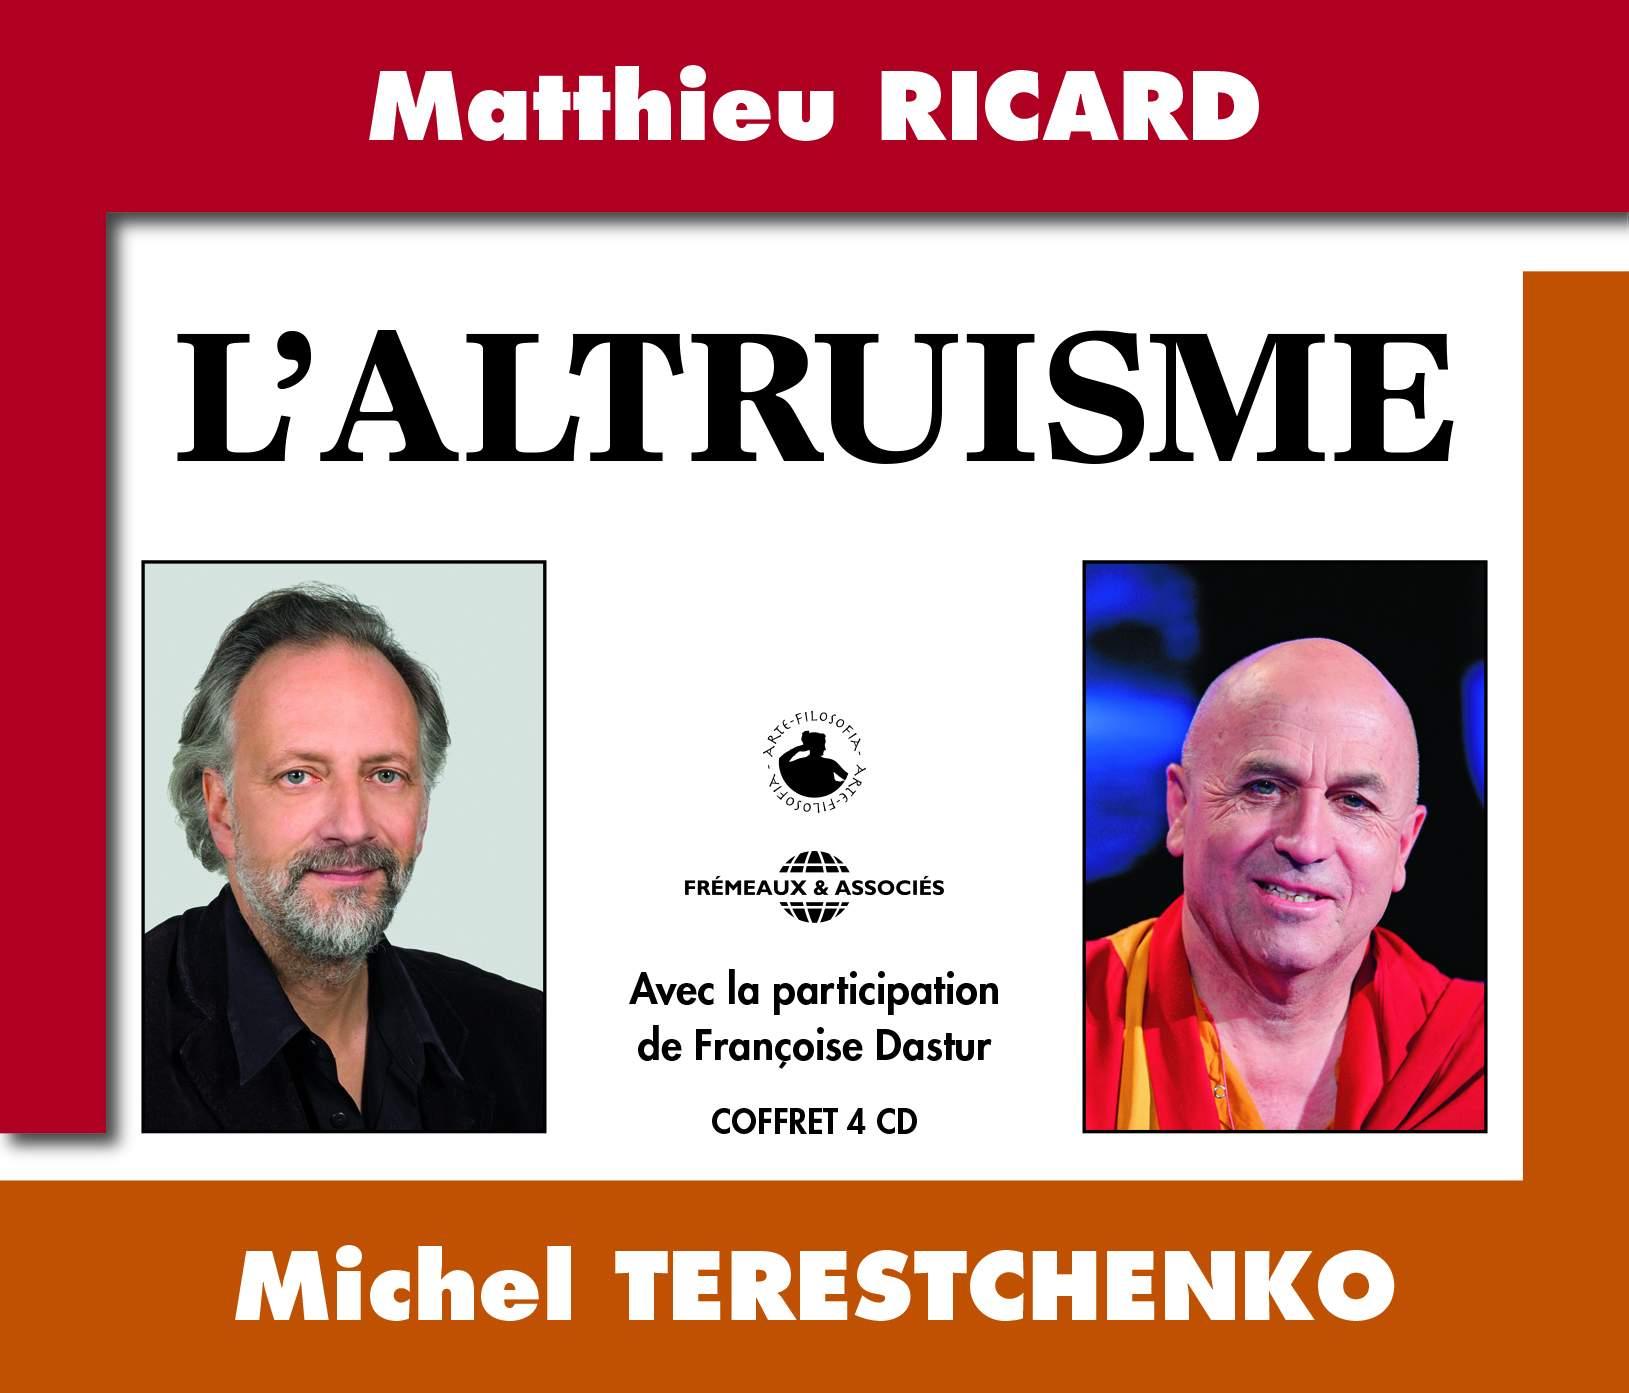 Couv+Dos Ricard Terestchenko FA5474-L